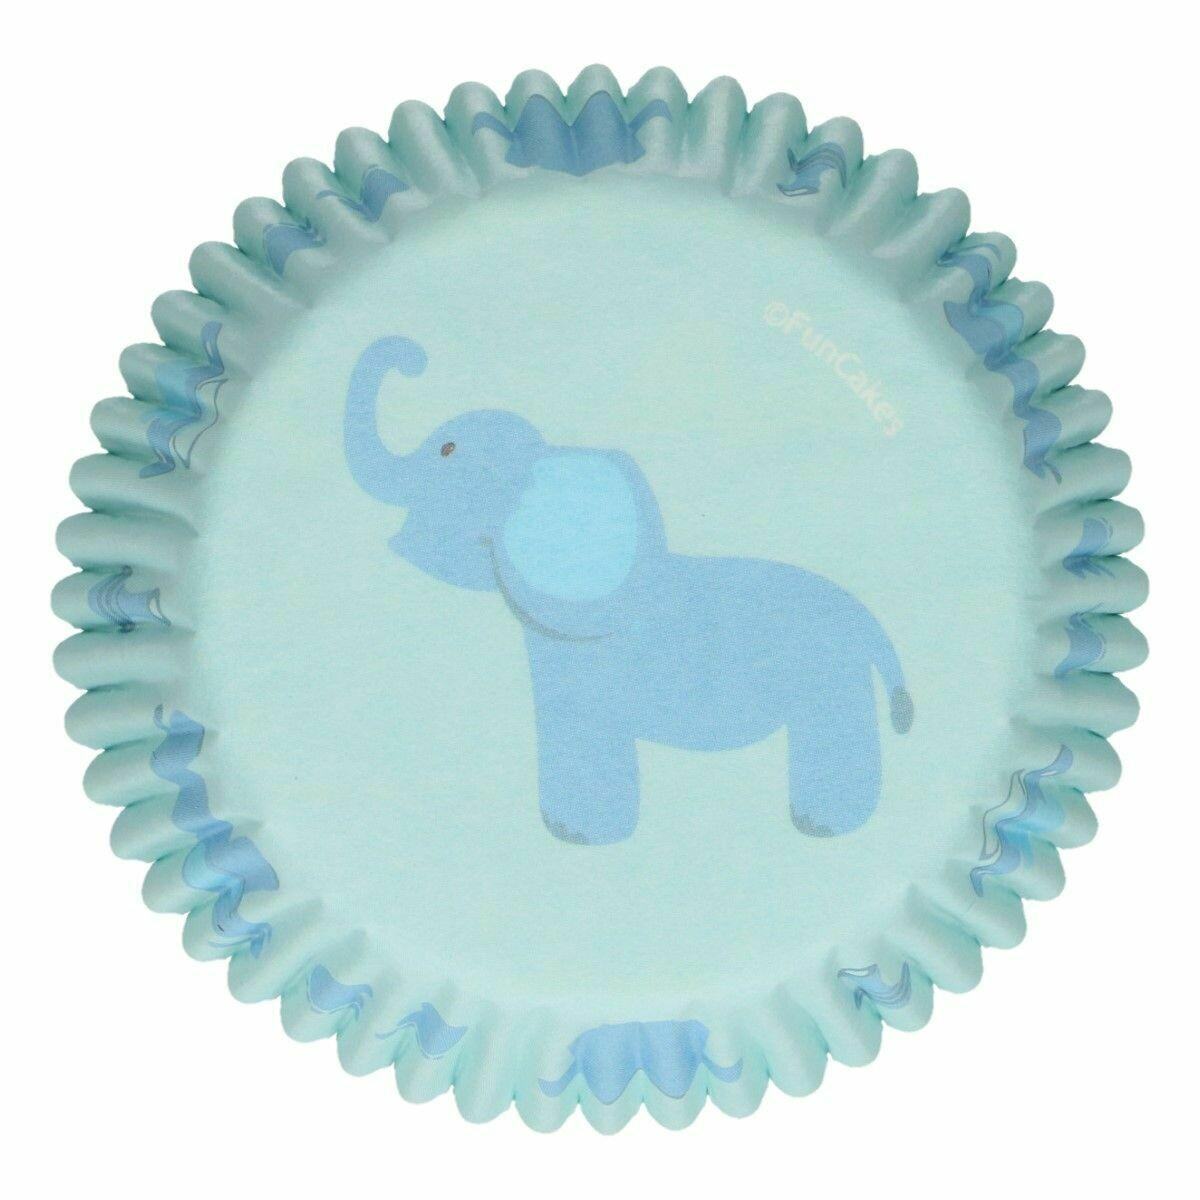 FunCakes Cupcake Cases -BABY ΒΟΥ -Θήκες Ψησίματος -Αγορίστικο Σχέδιο -48 τεμ